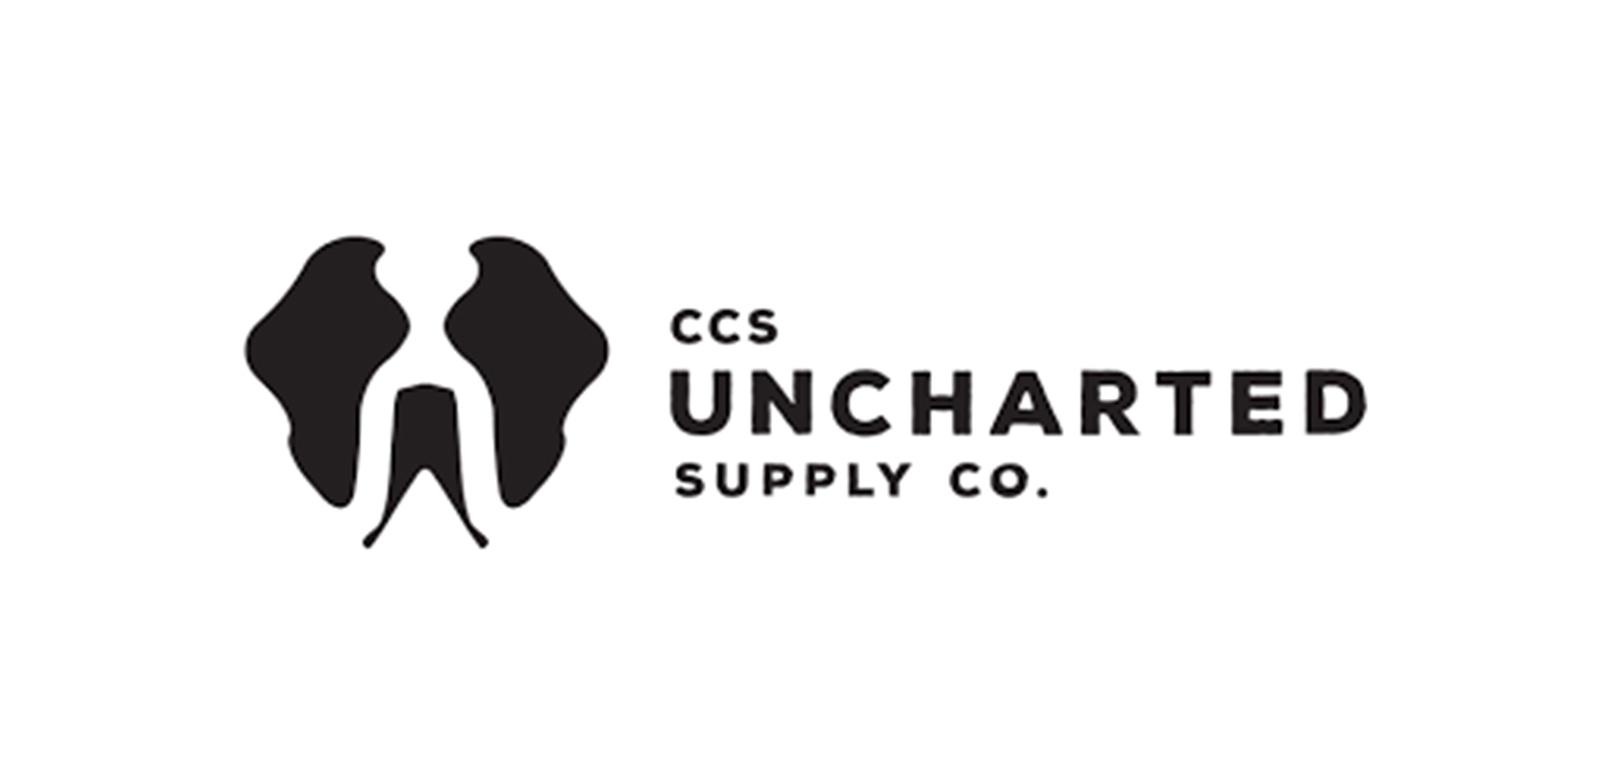 Uncharted Supply Co Logo